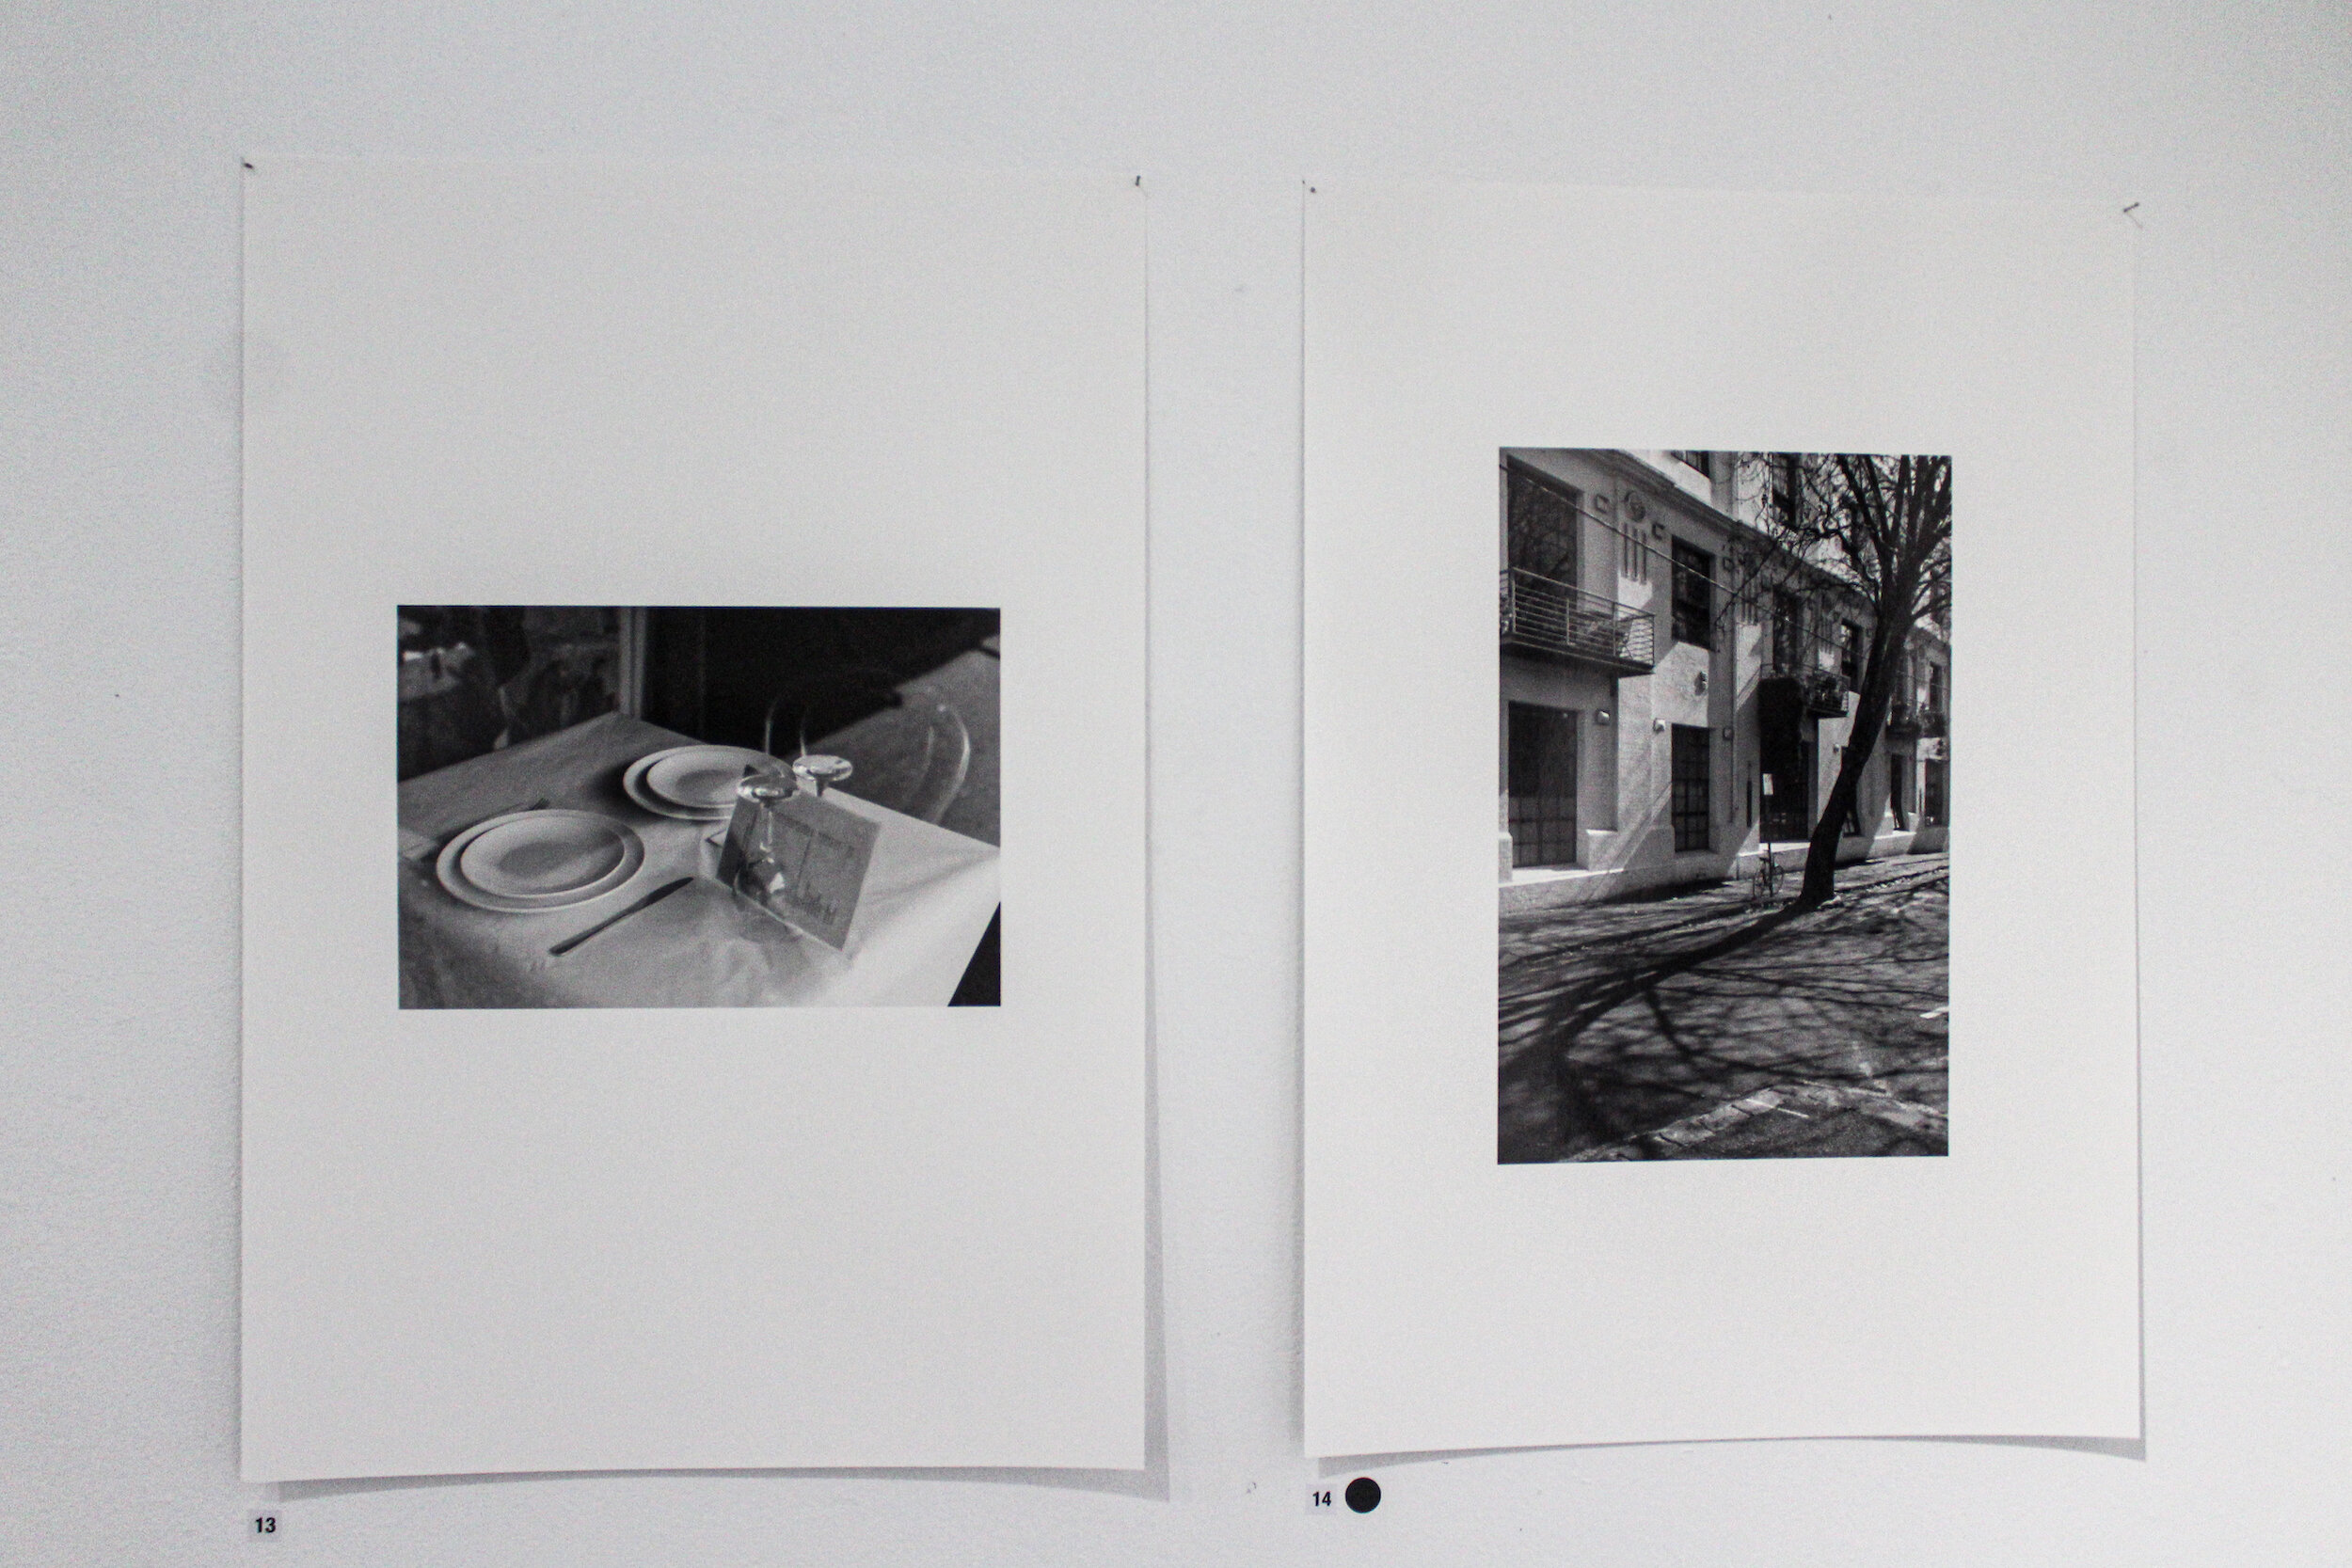 Richard Gerraty,  George Street,  giclée print, 18 x 27cm;  Kerr Street , giclée print, 18 x 25cm